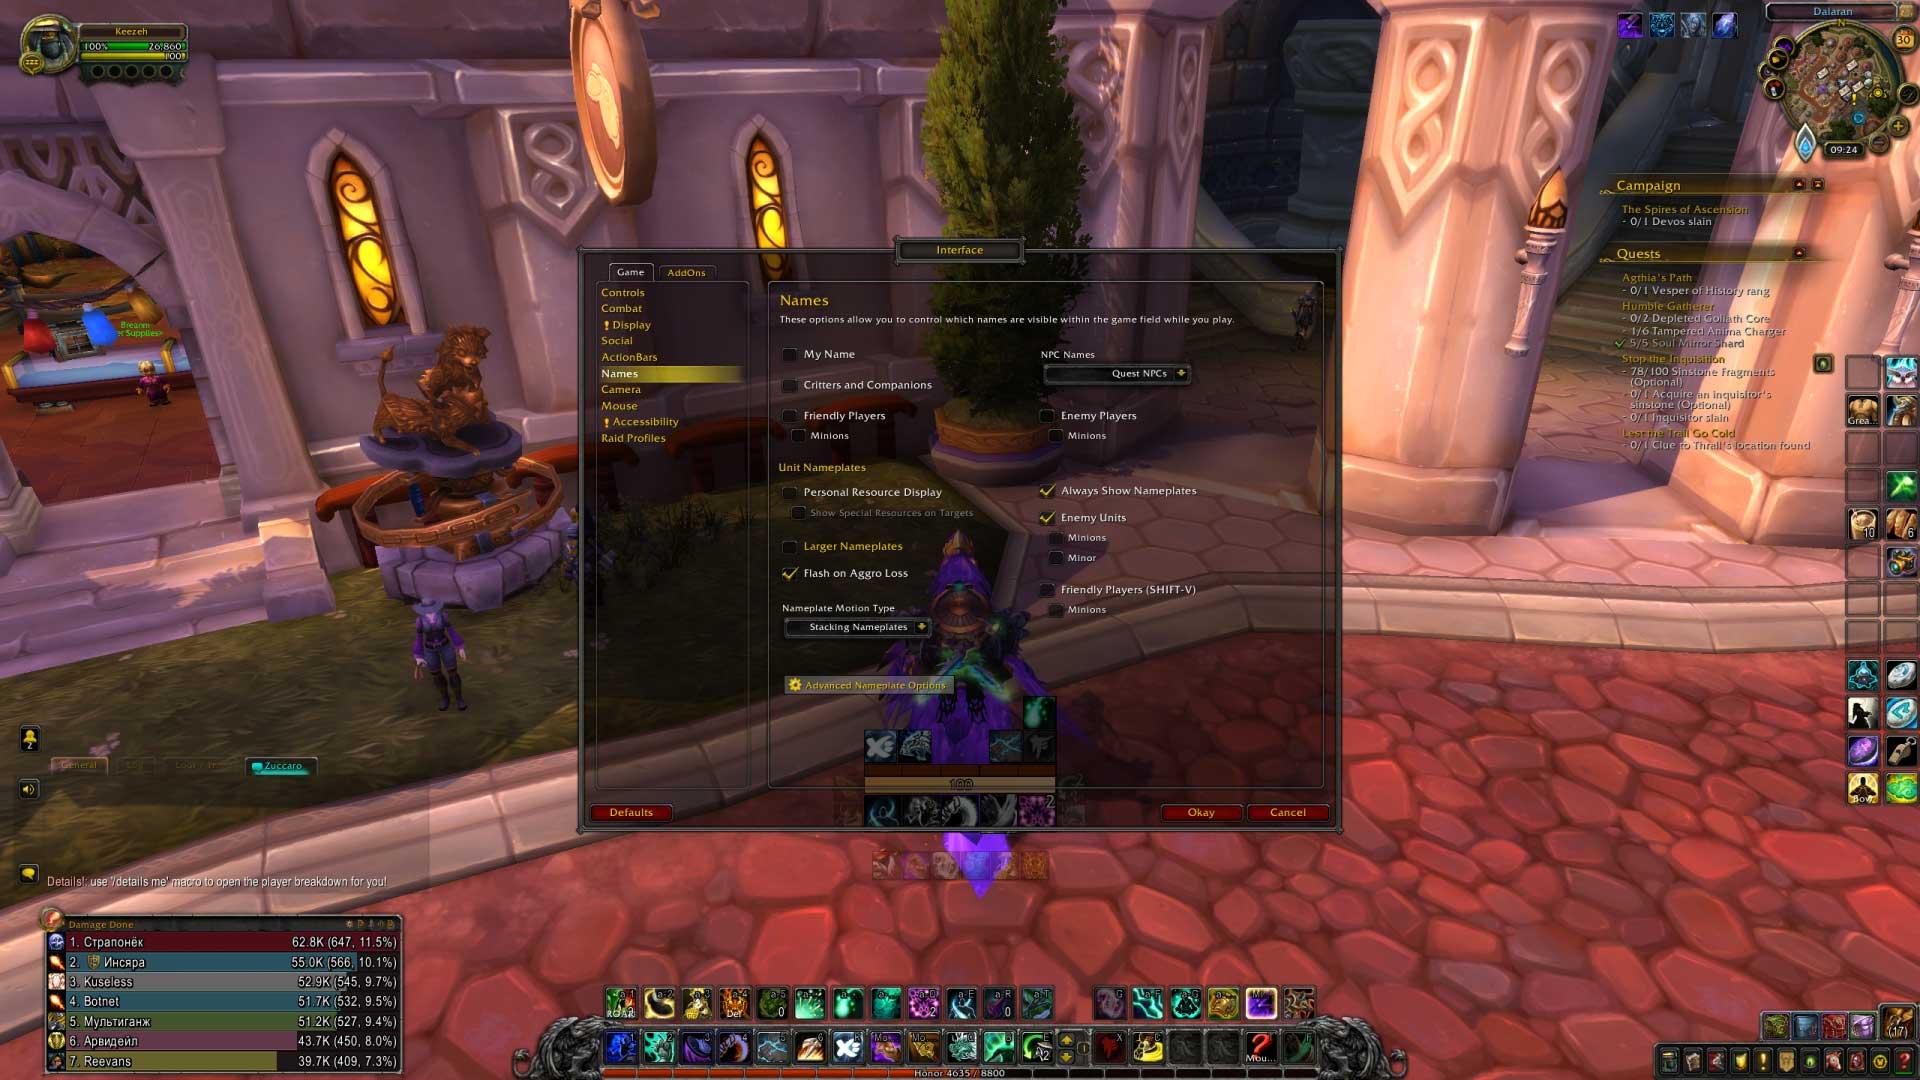 World-of-Warcraft-Ustawienia-interfejsu-4